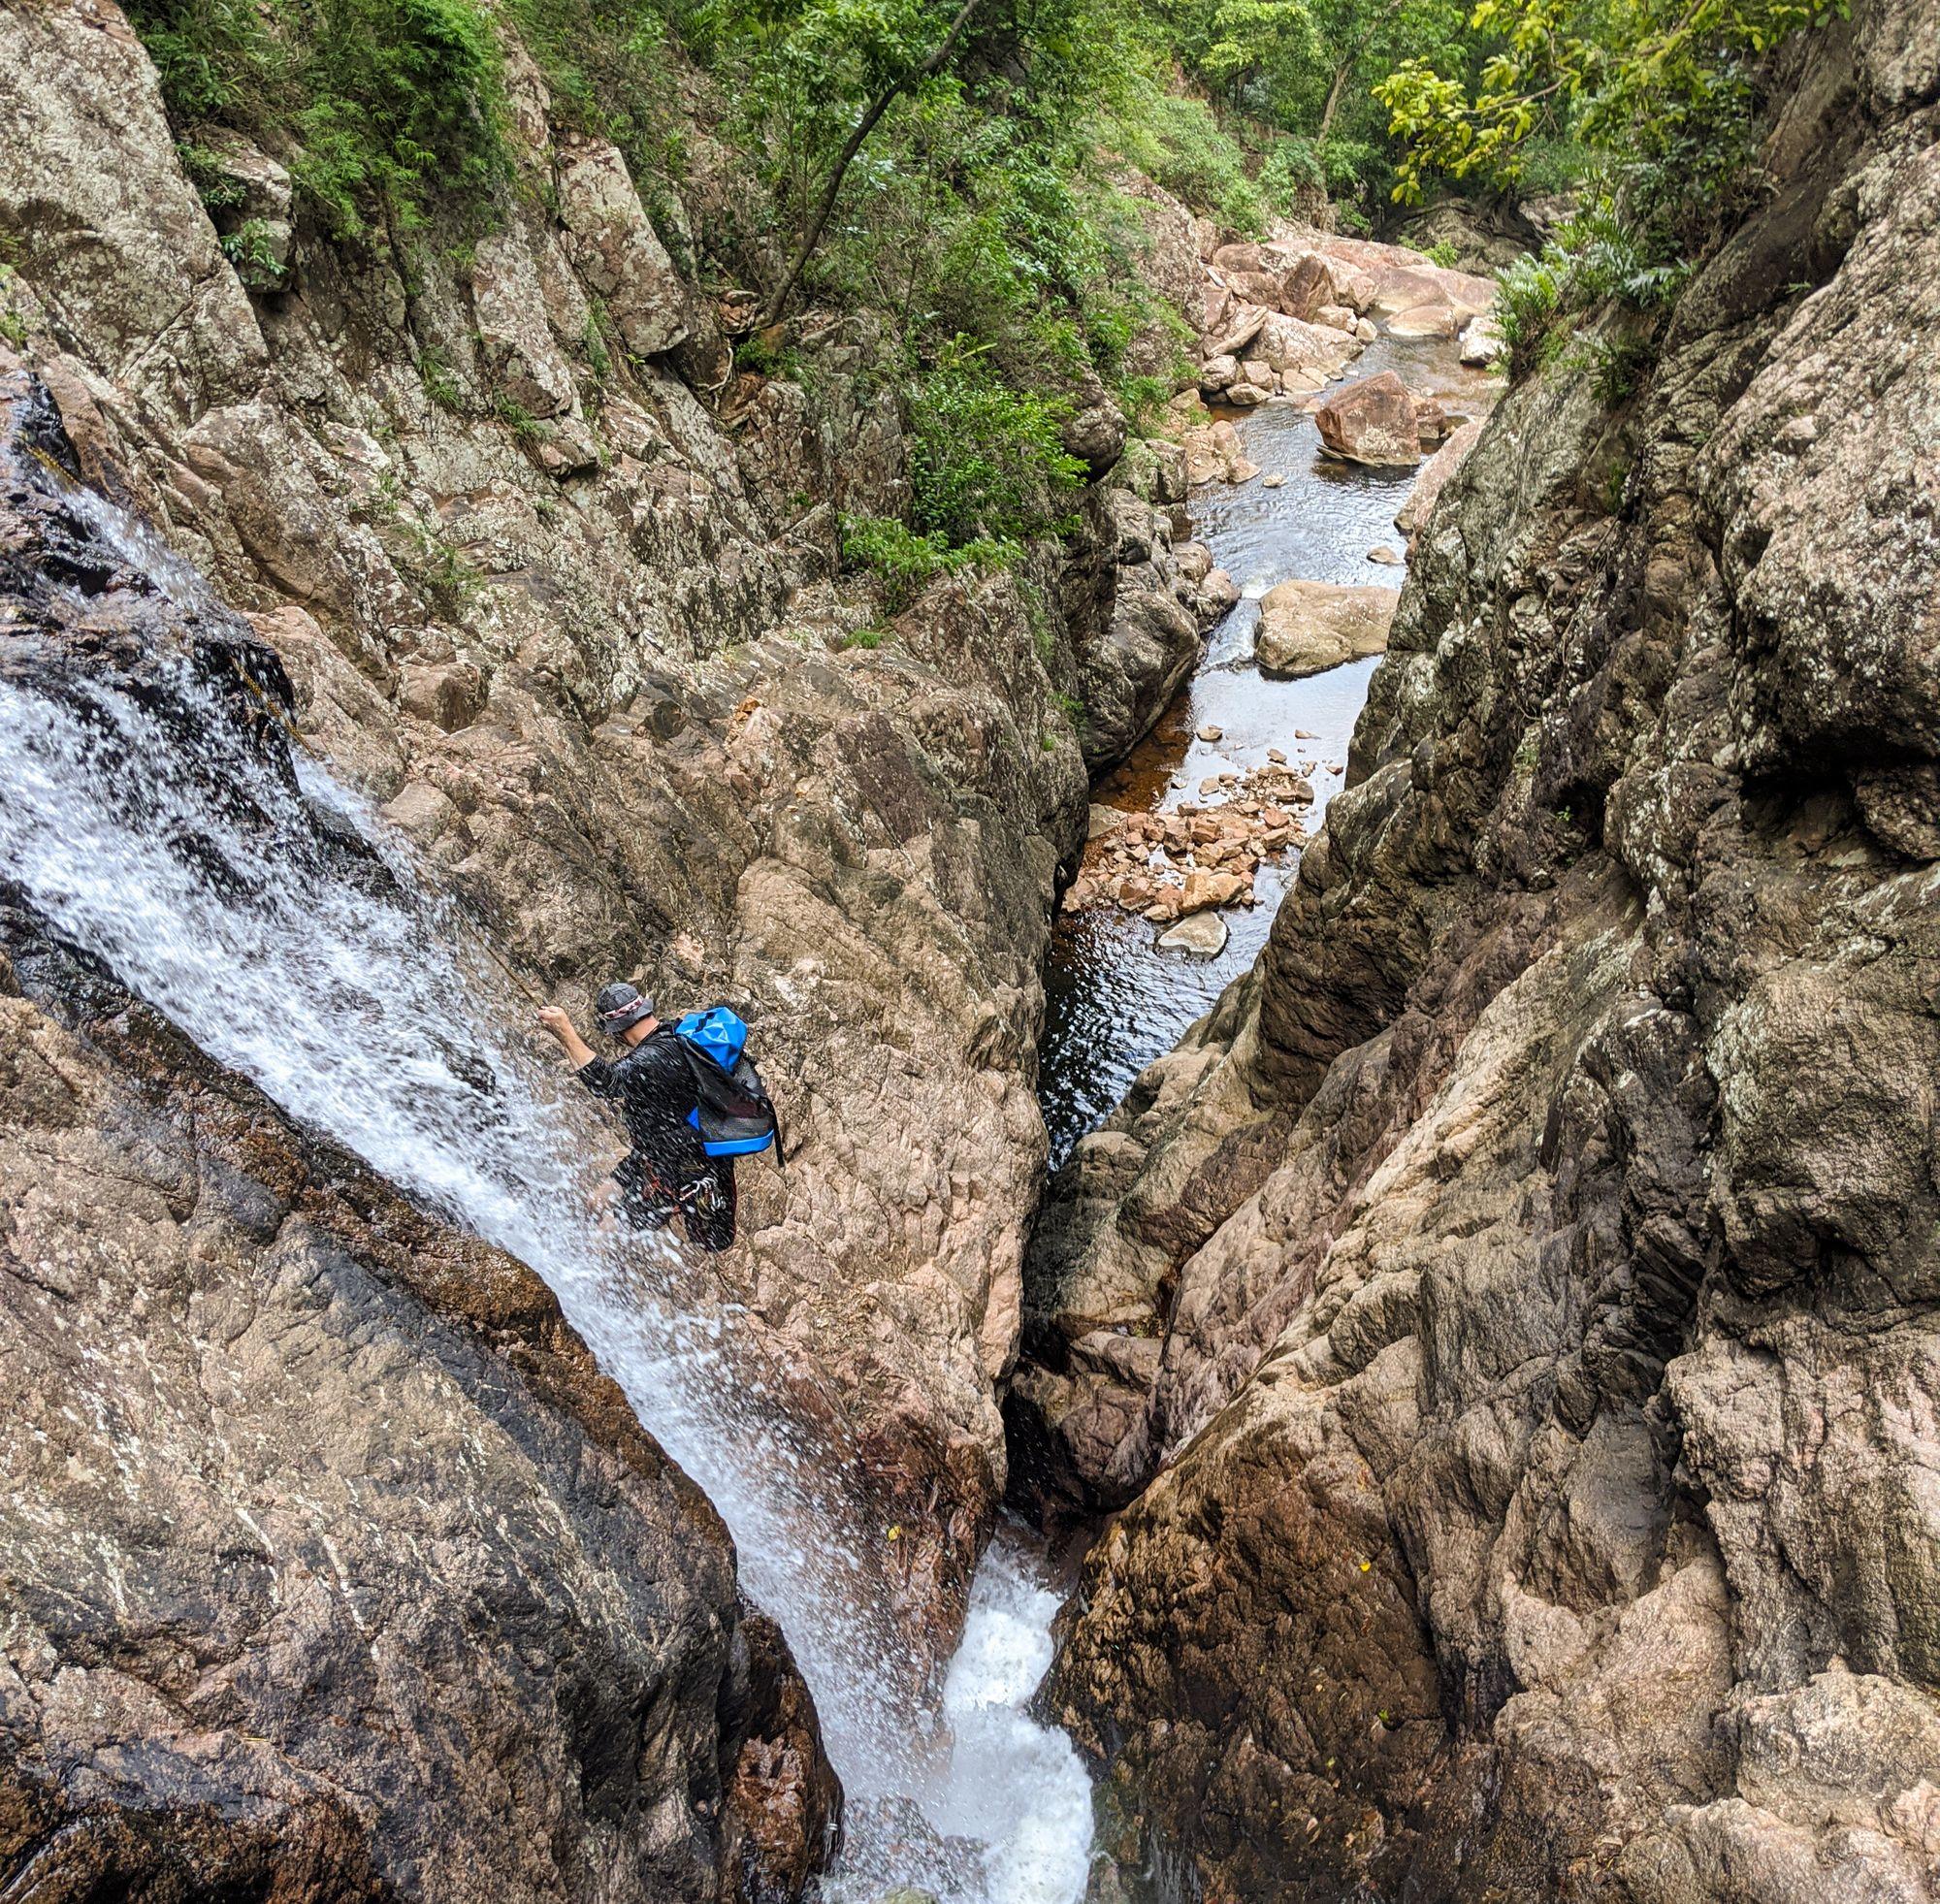 Tinkle Canyon, Tinkle Creek